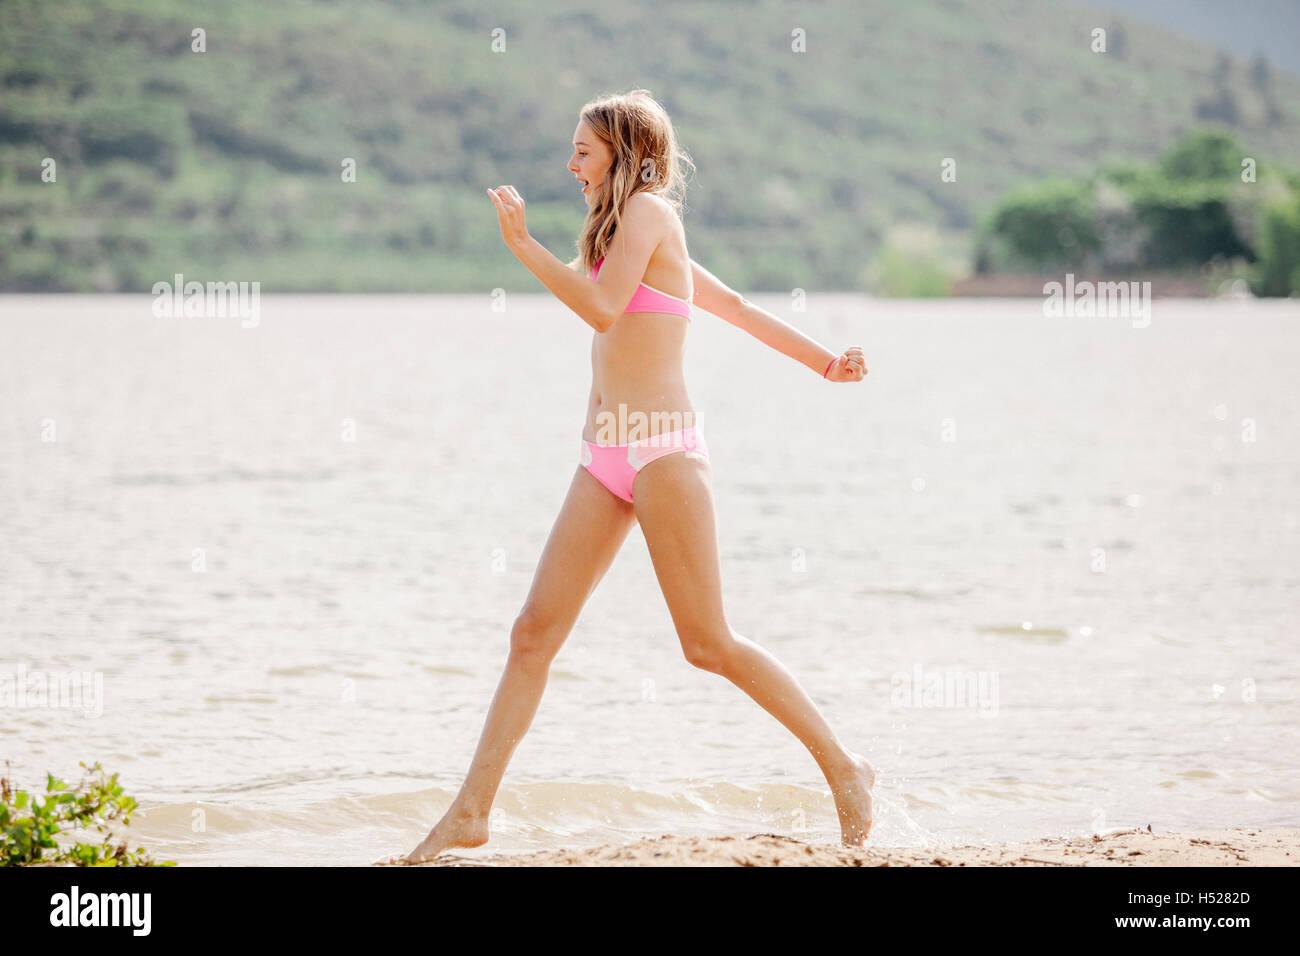 Teenage girls wearing a pink bikini running along a sandy ...